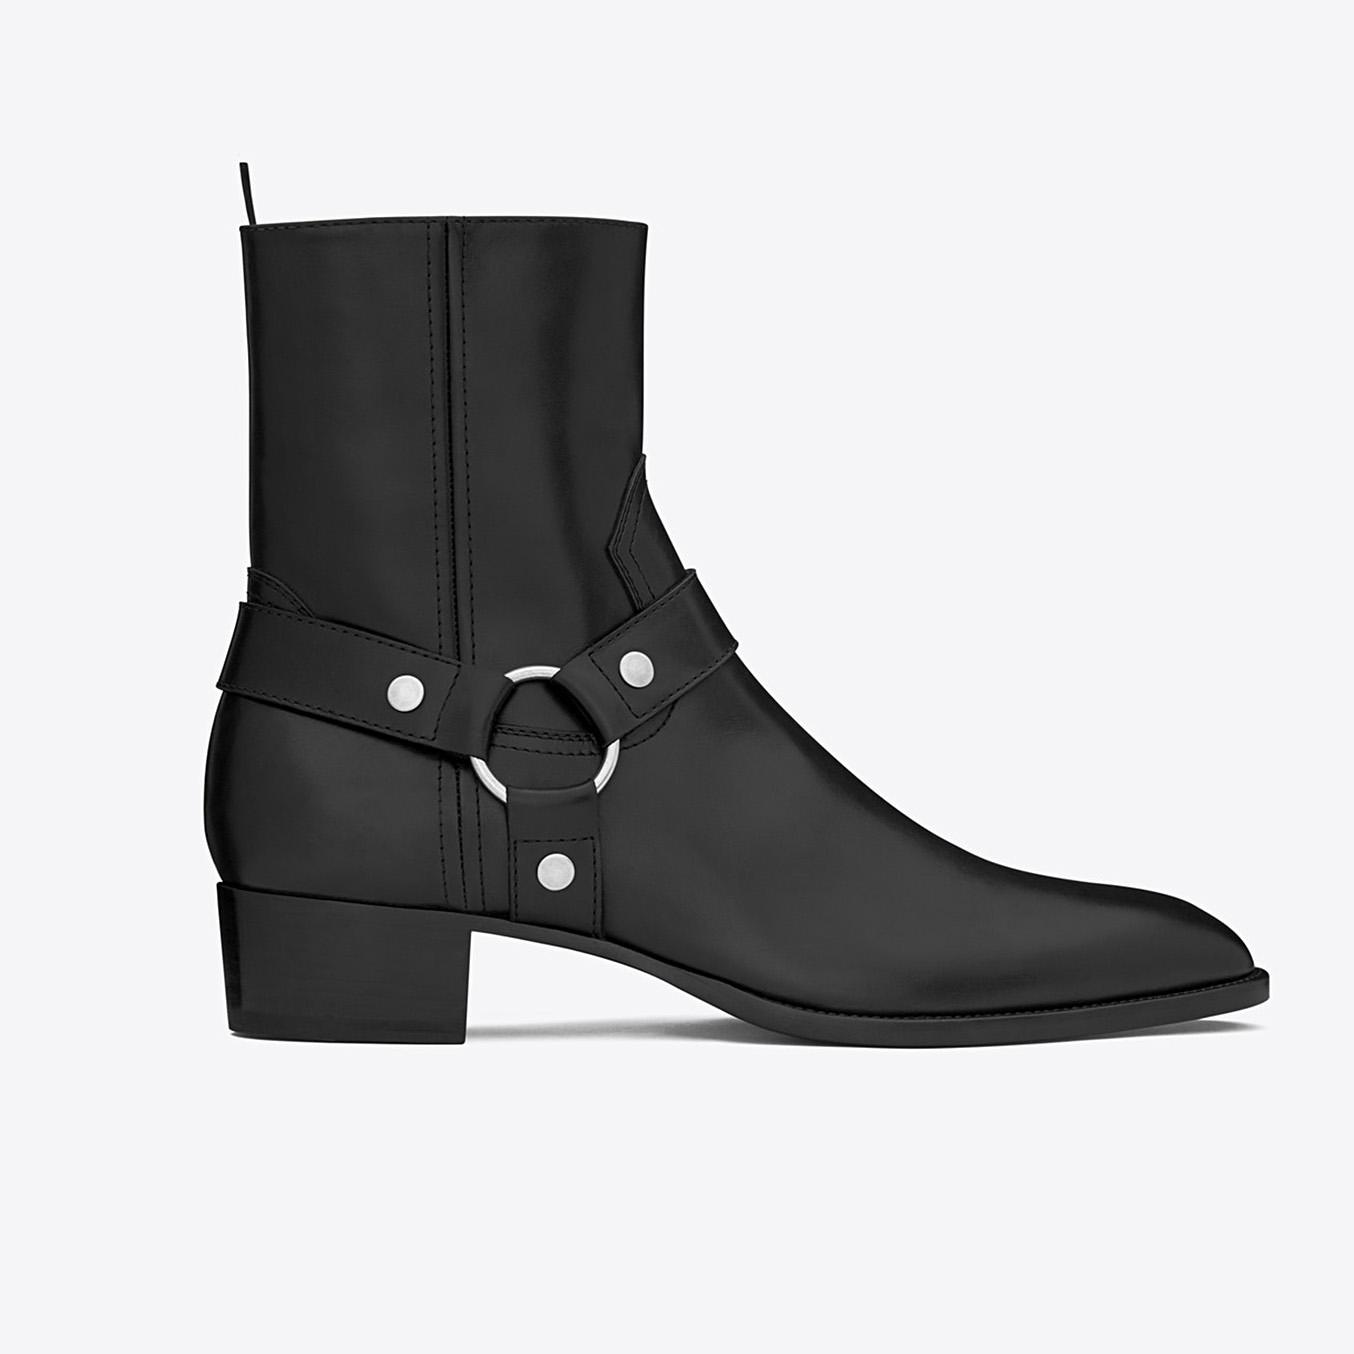 Saint Laurent Wyatt 40 Harness Boot In Black Leather